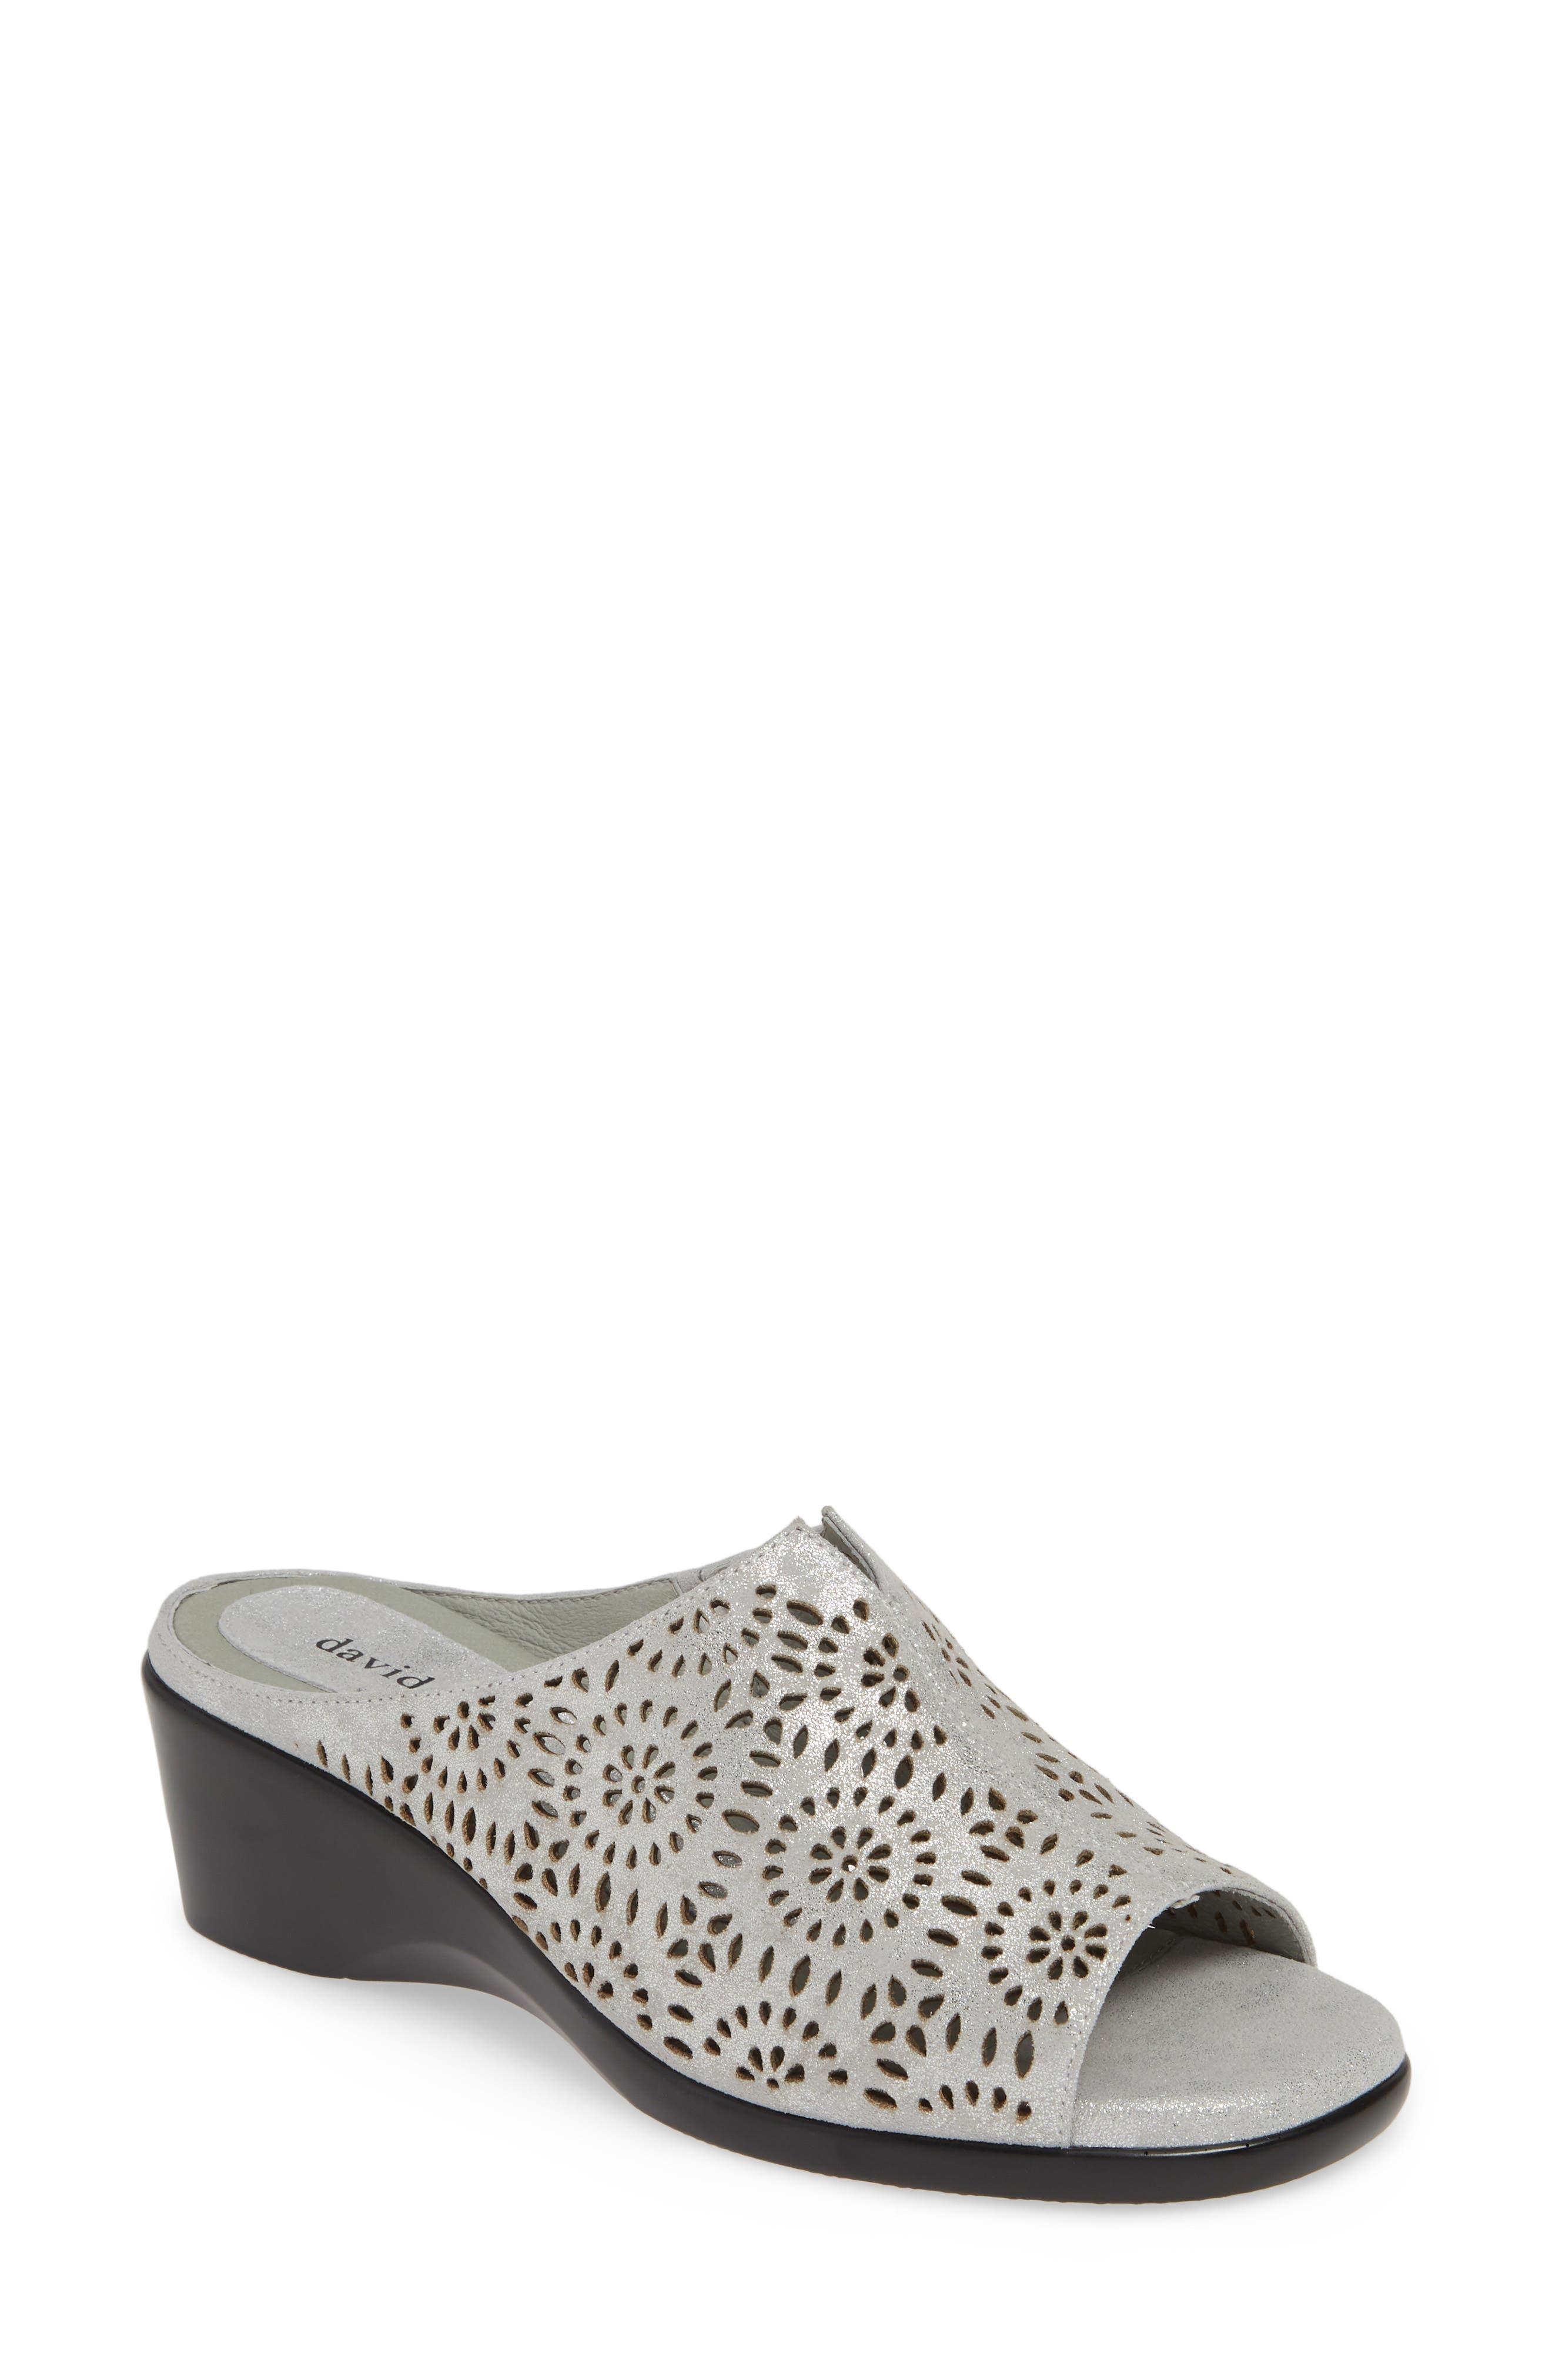 Sublime Wedge Sandal